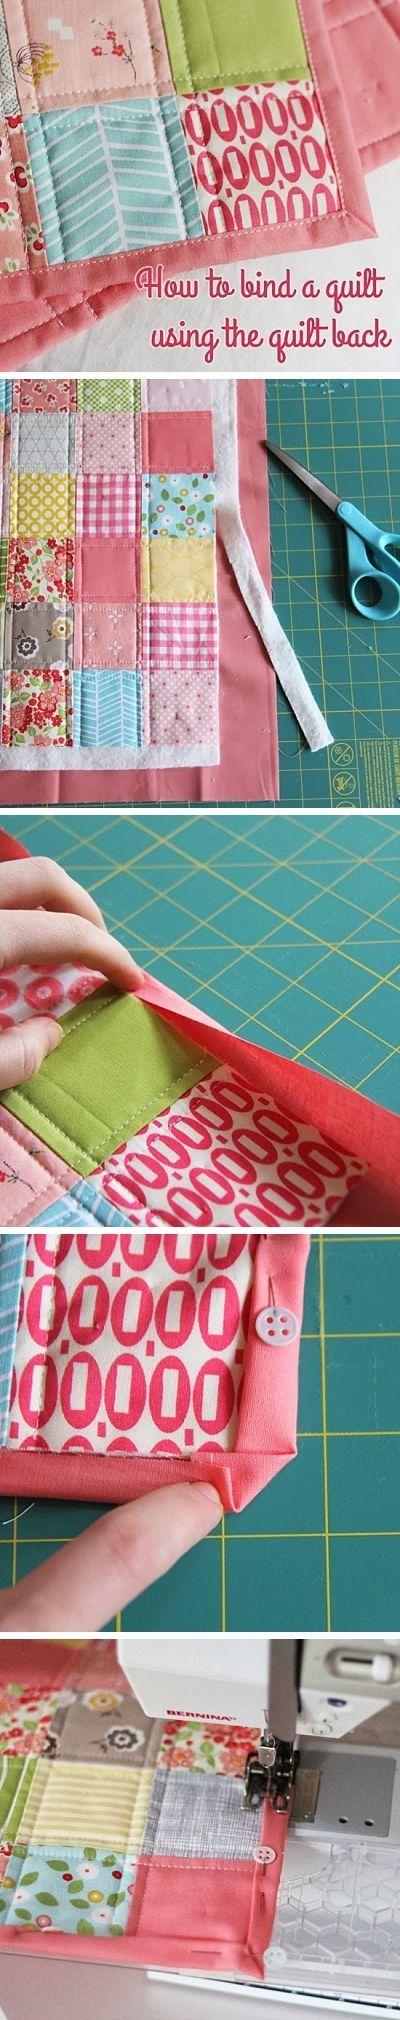 Afwerken Van Een Quilt.Binding A Quilt With The Quilt Back Quilt Afwerken